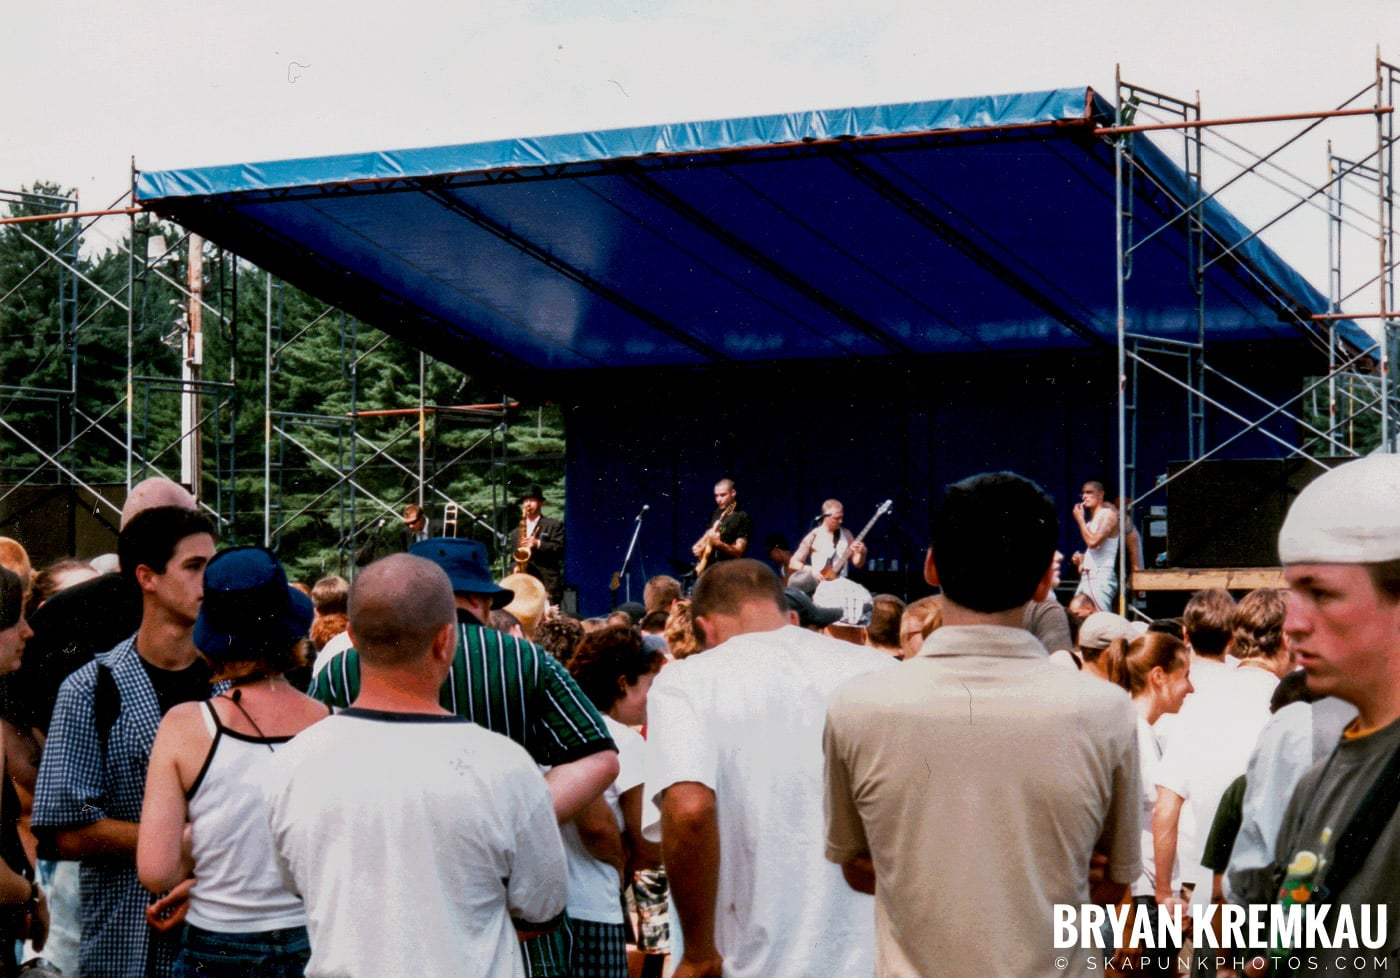 The Skoidats @ New England Ska Fest 98, Westford, MA - 8.22.98 (8)